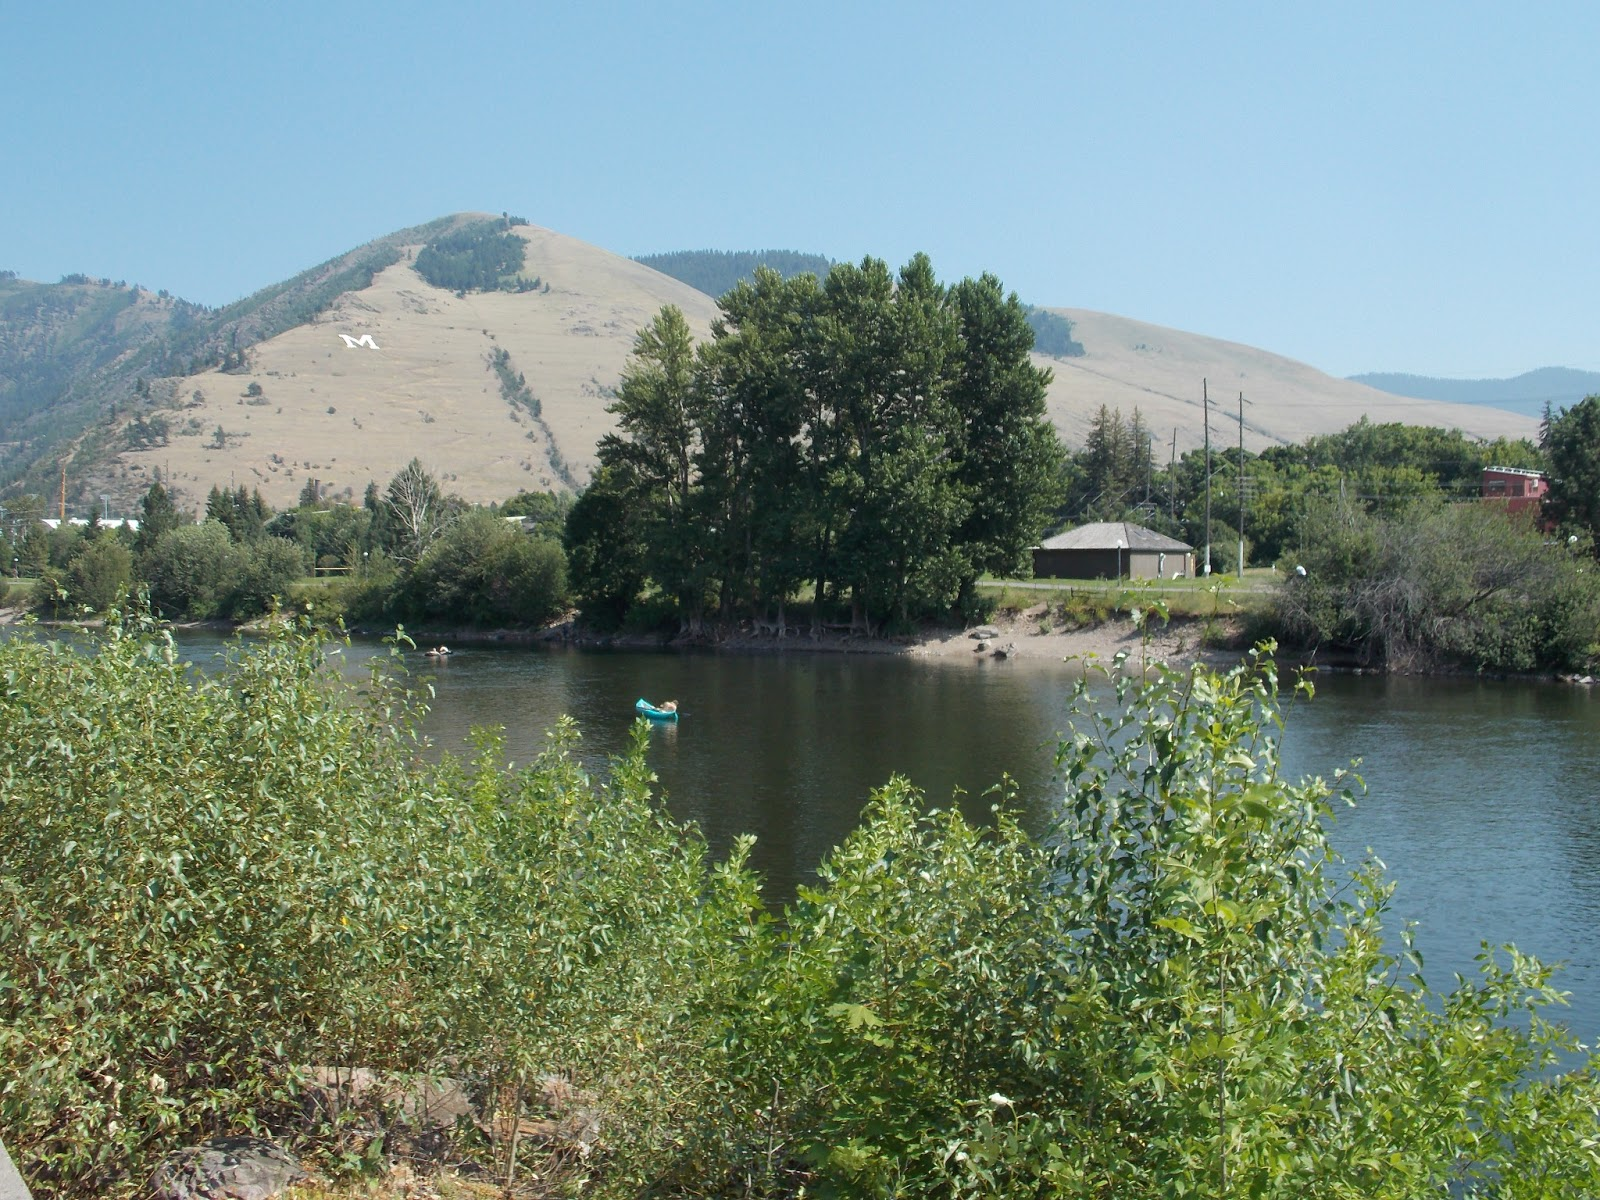 The Schramm Journey Missoula Montana